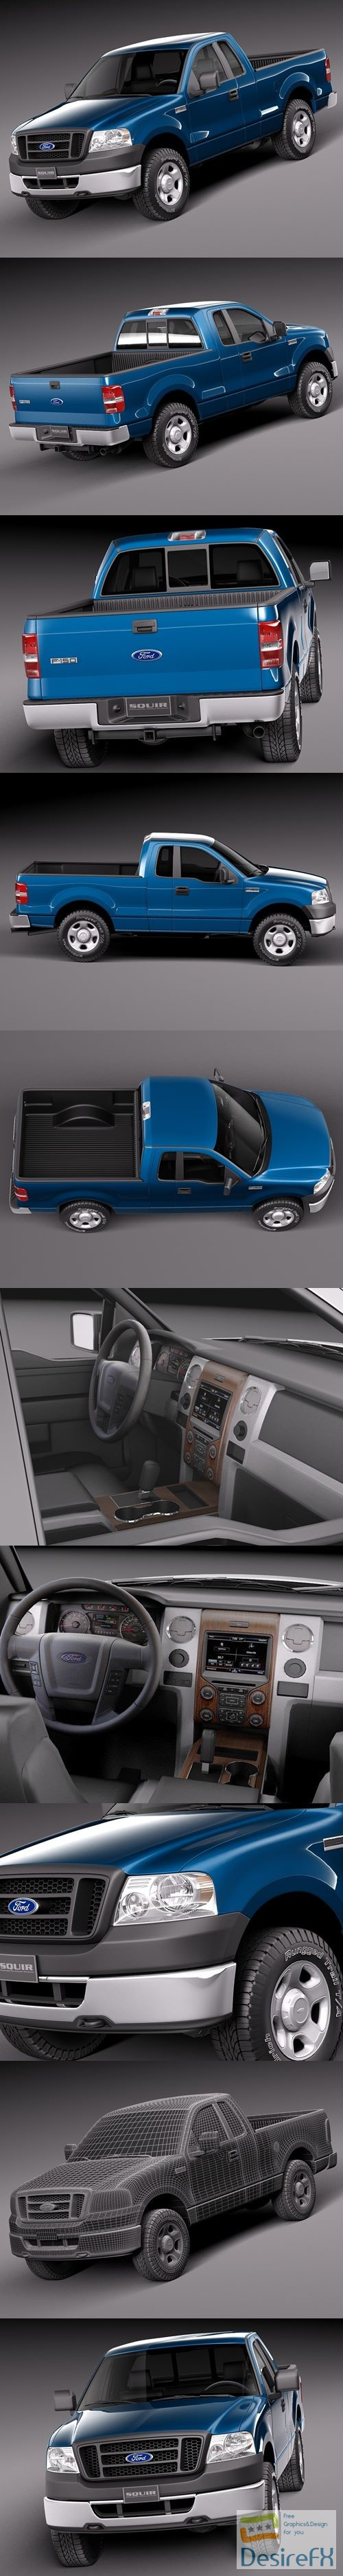 Ford F150 Regular Cab 2006 3D Model